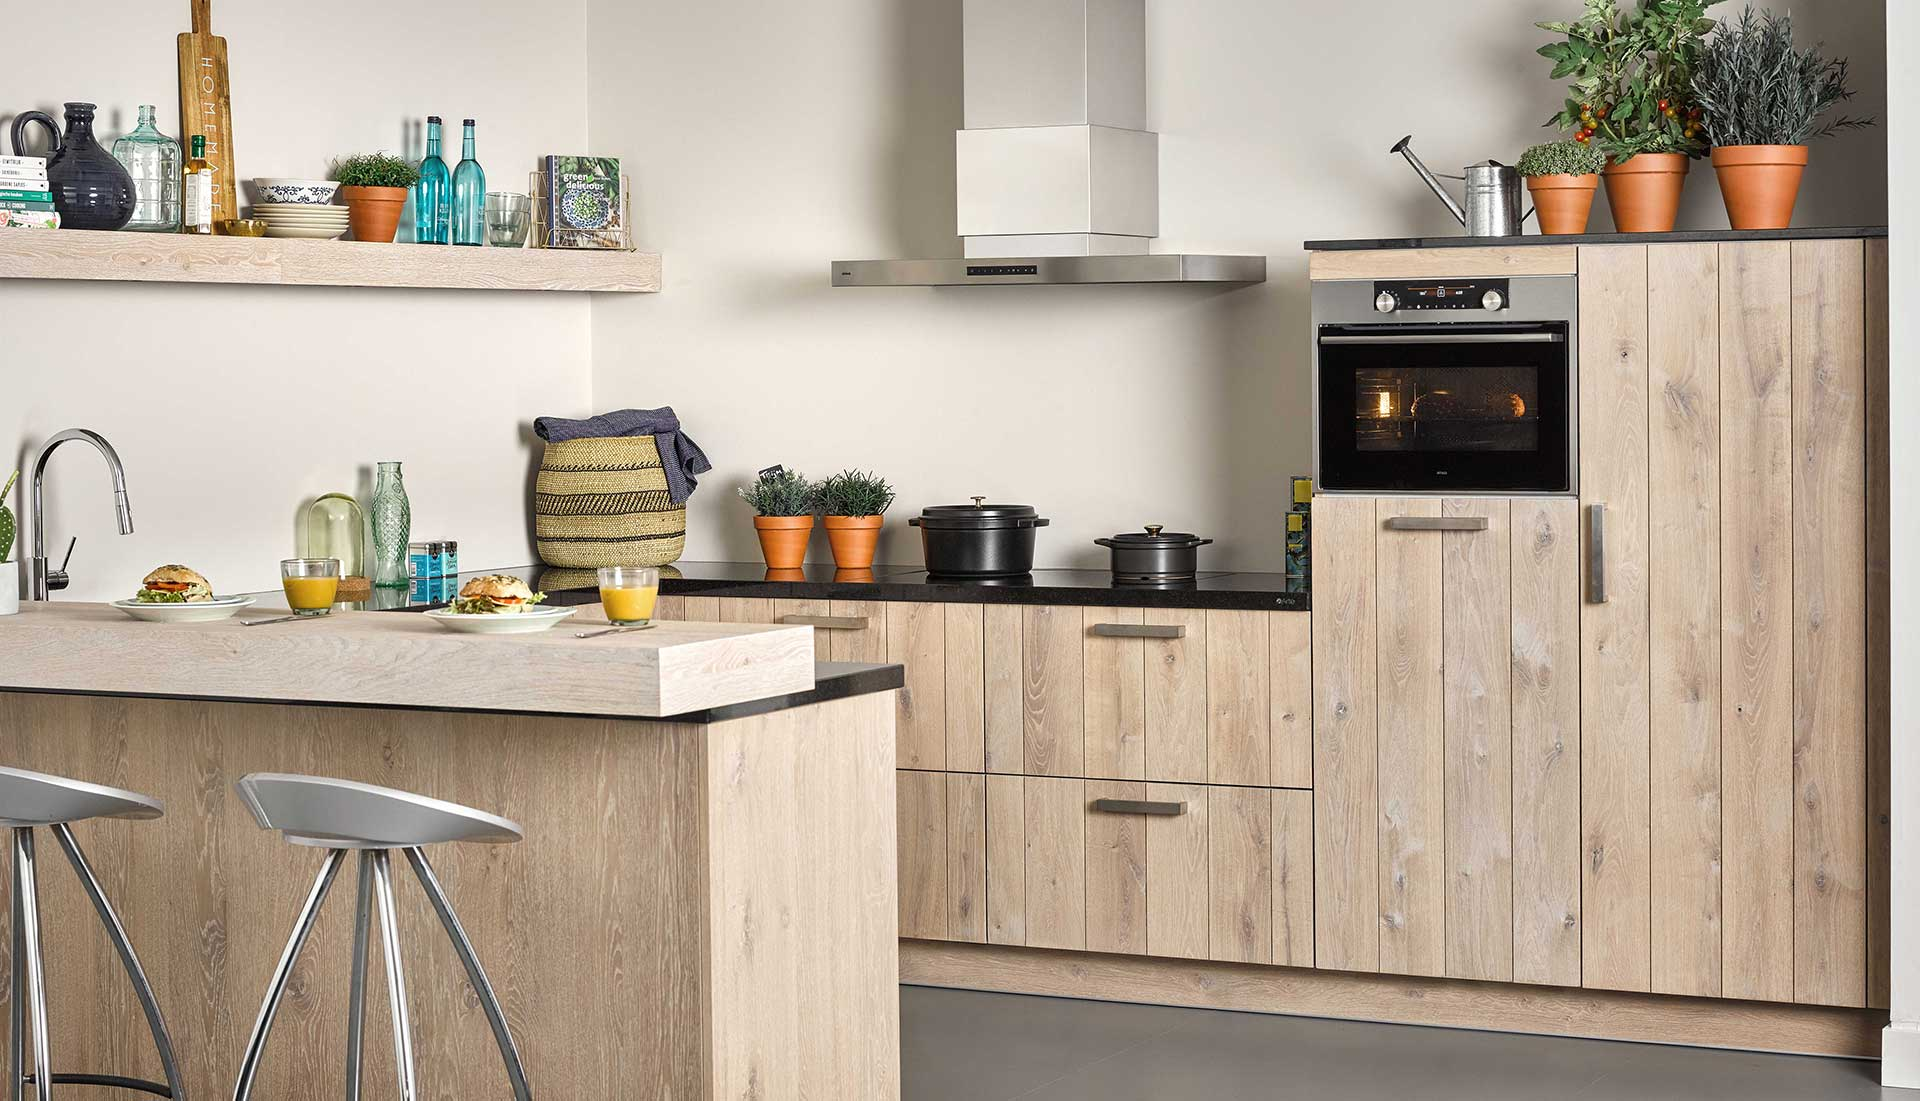 Enviroo-Keukens-UniekeKeuken_ATAG